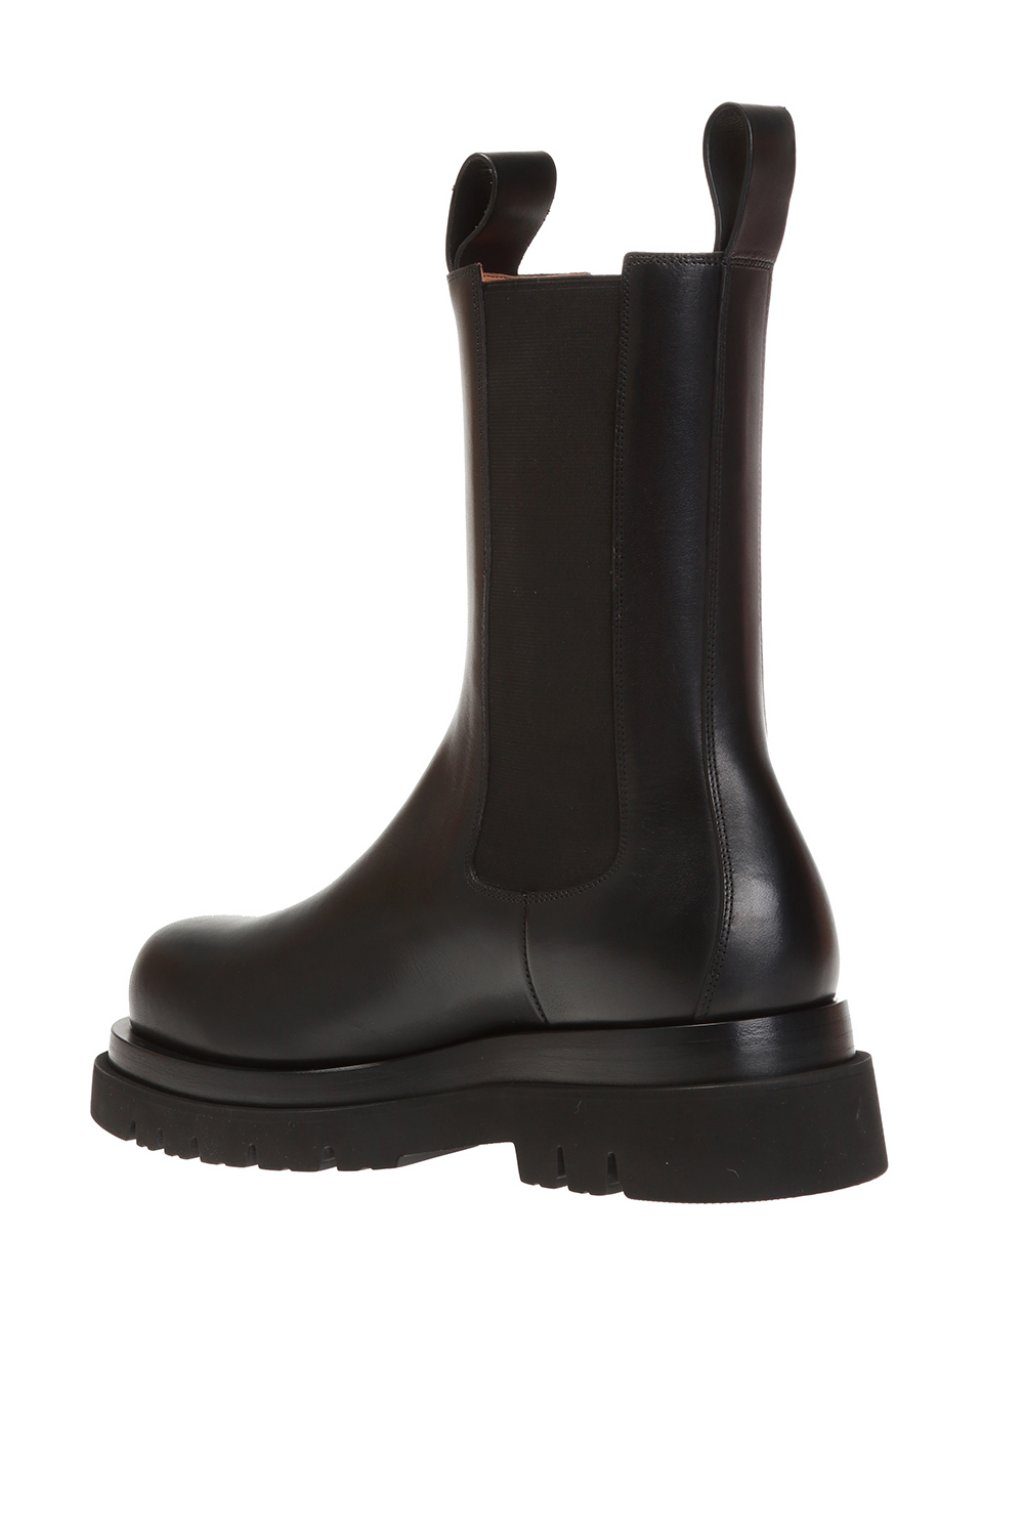 Bottega Veneta Platform boots